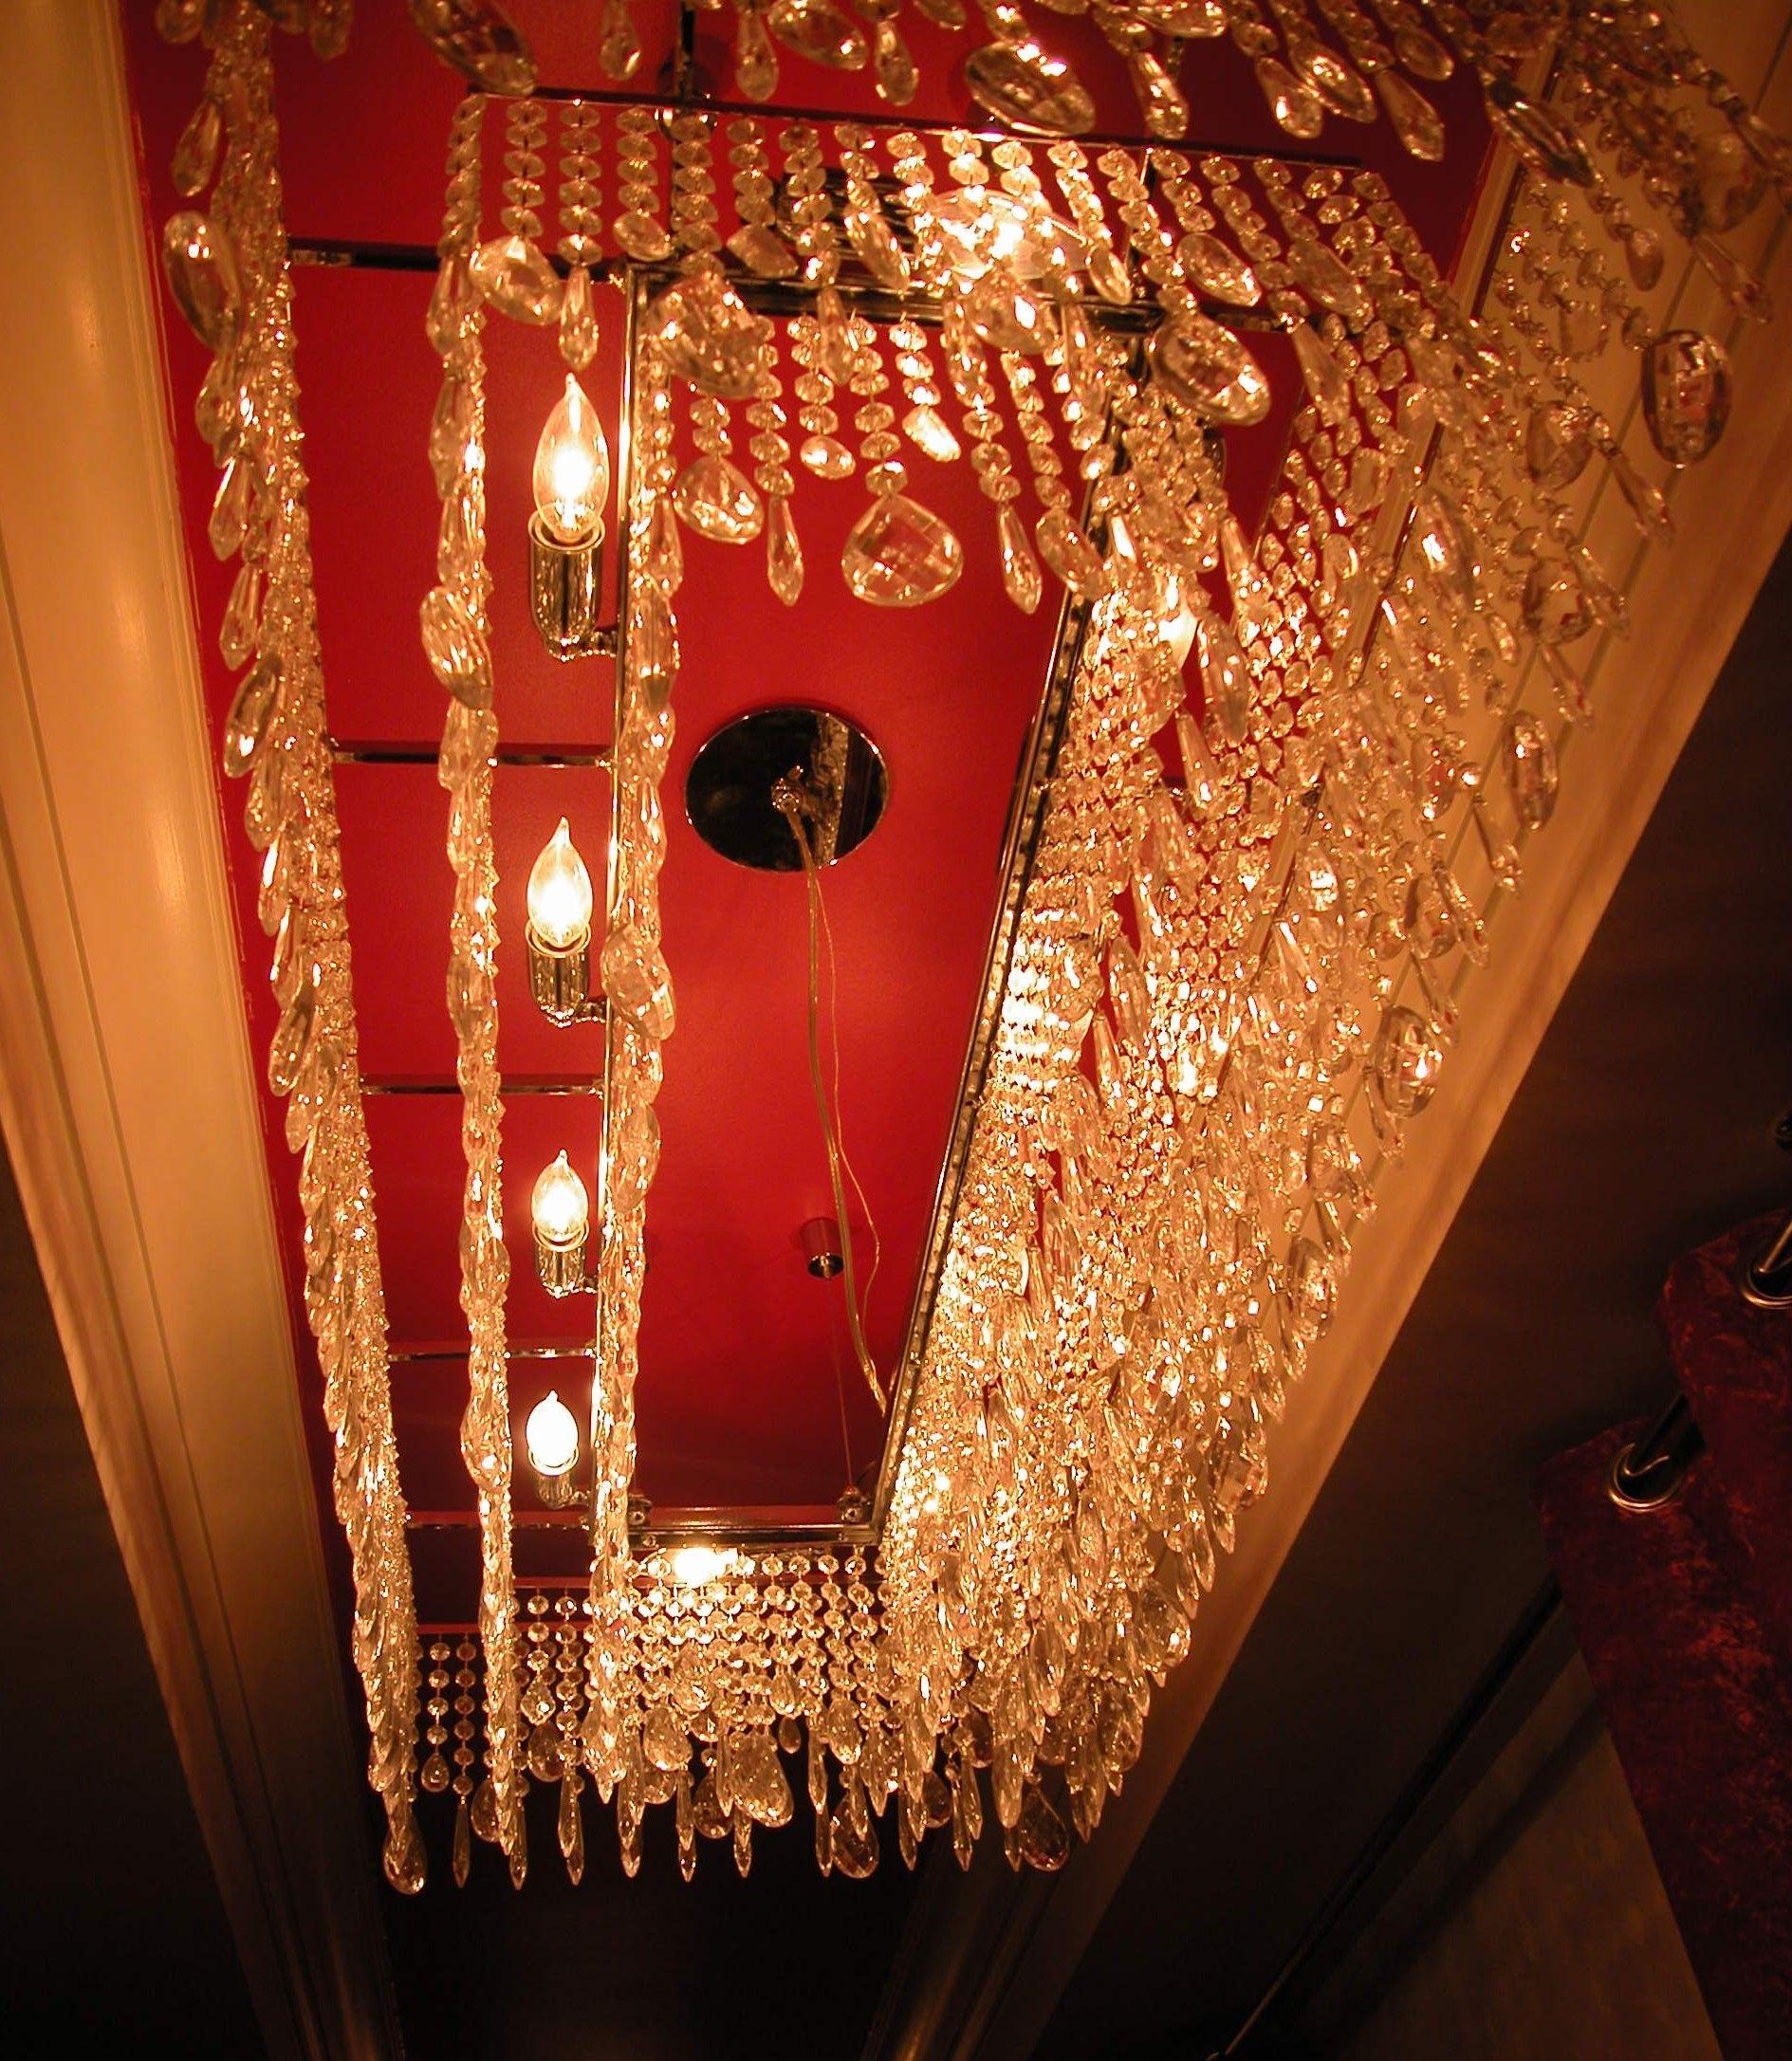 Wonderful chandelier inside The Mansion on Forsyth in Savannah